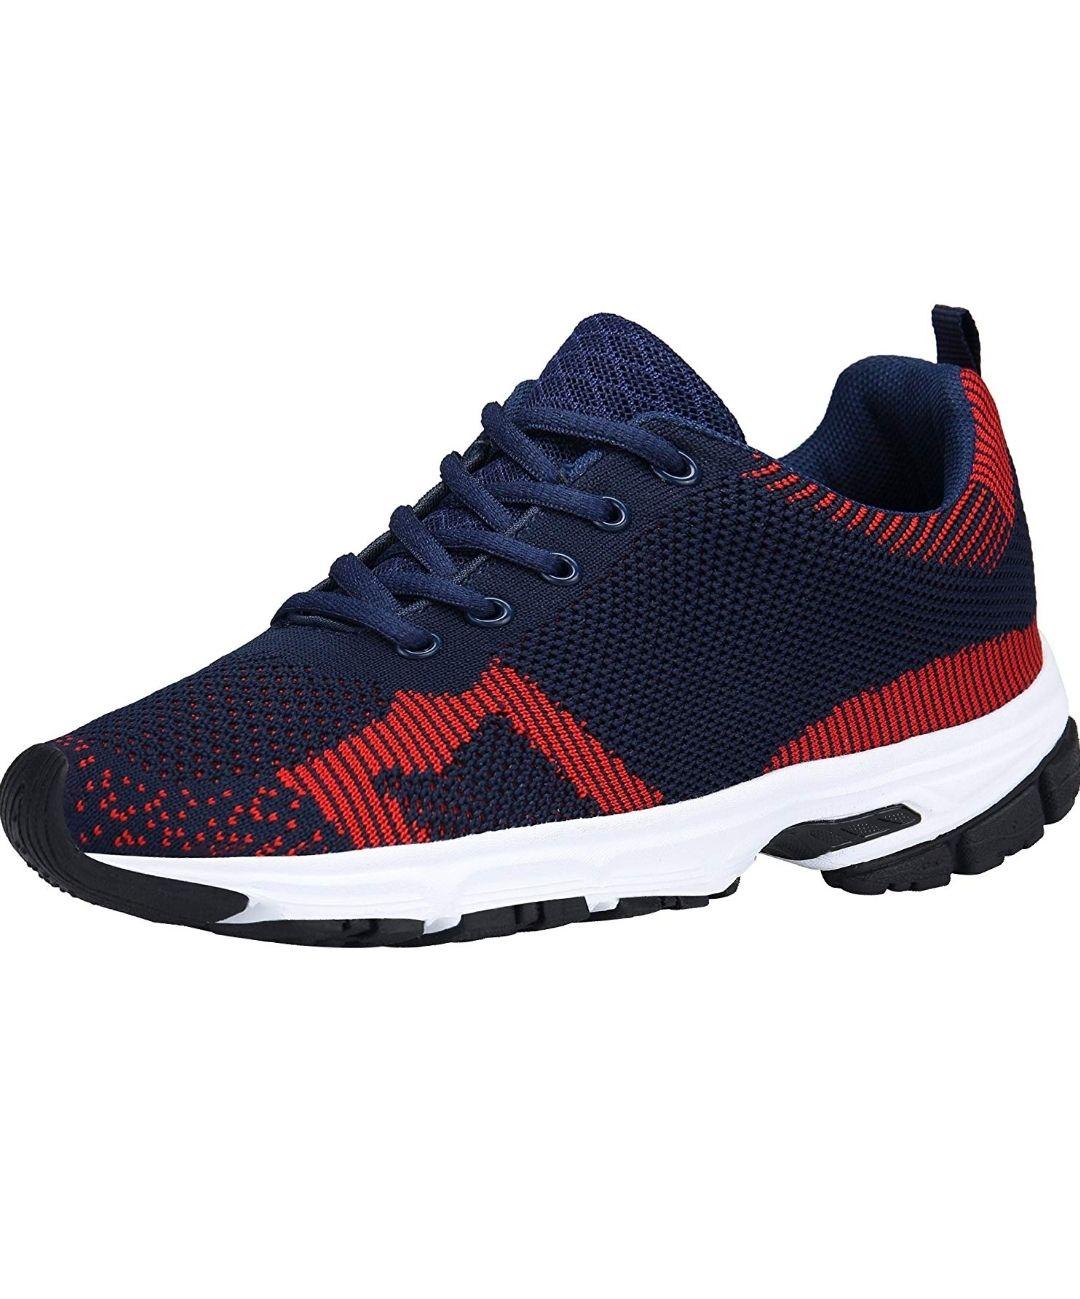 Zapatillas deportivas de mujer running fitness sneakers